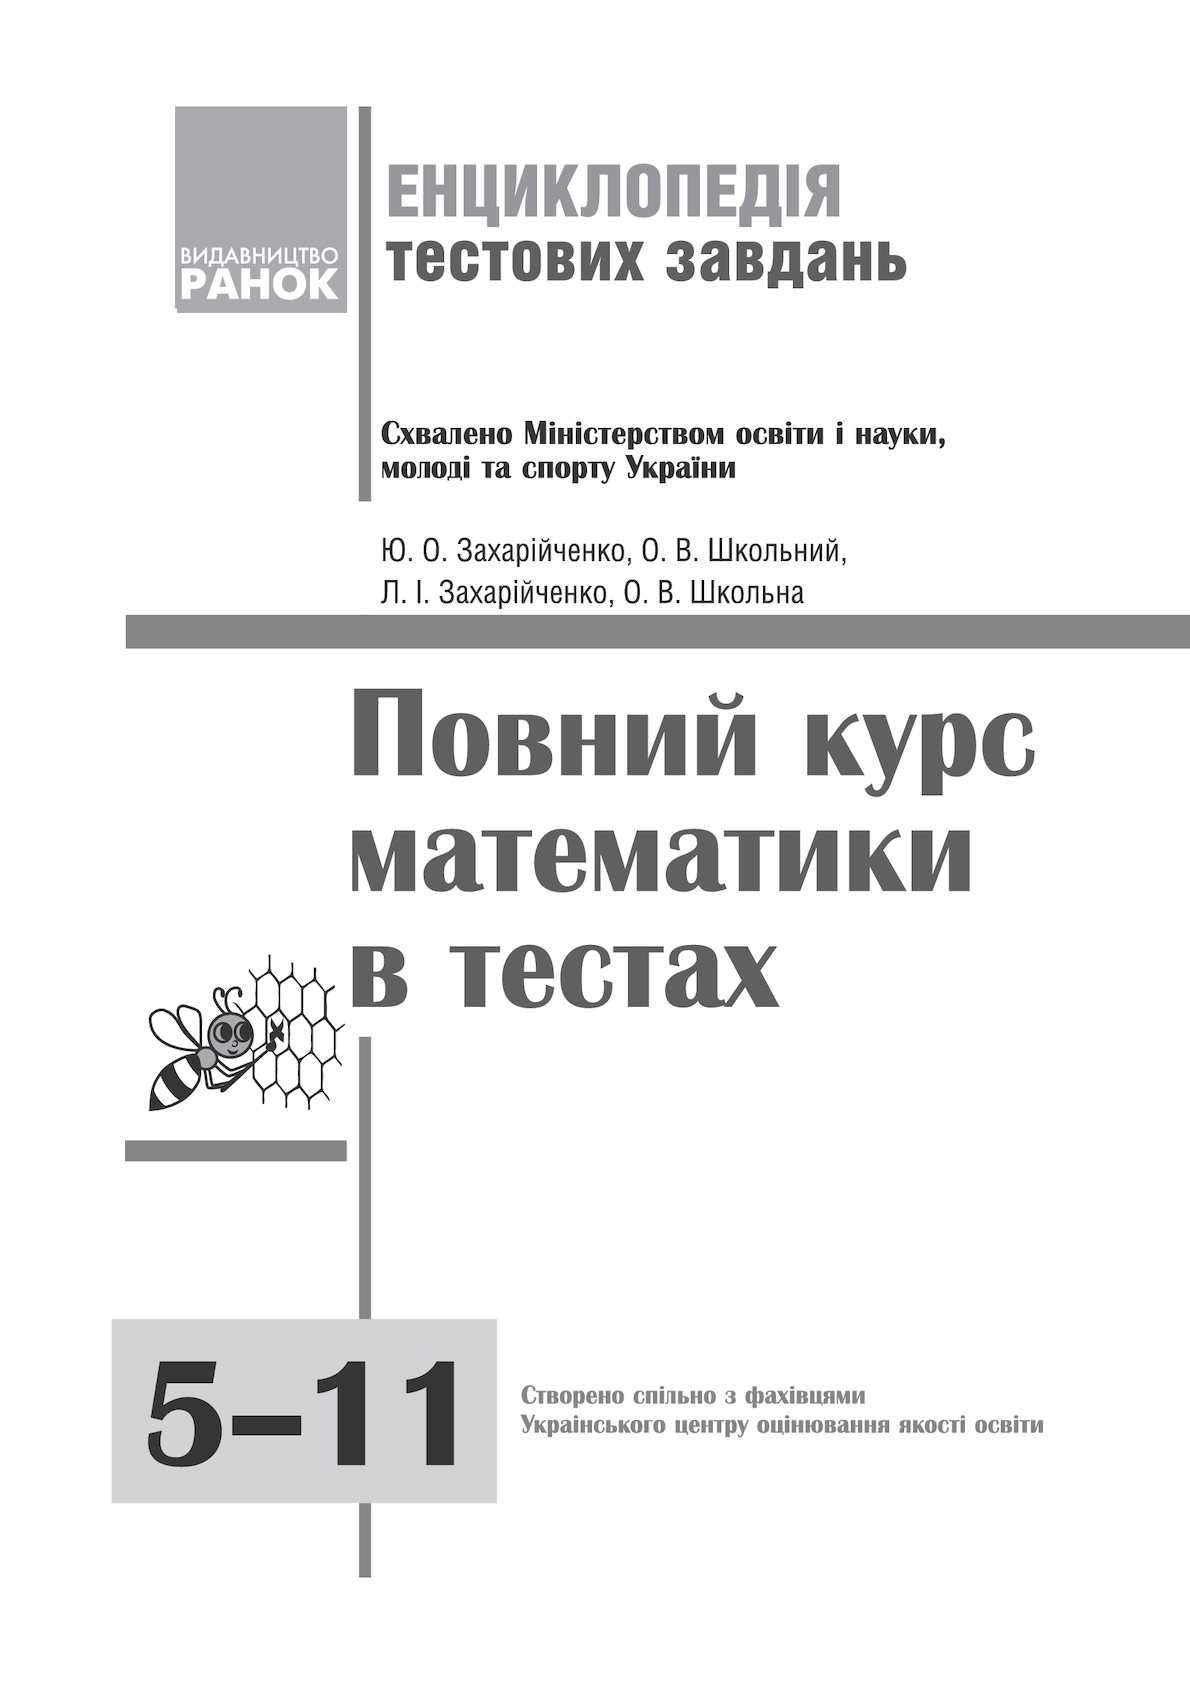 ЗНО Захарійченко - CALAMEO Downloader